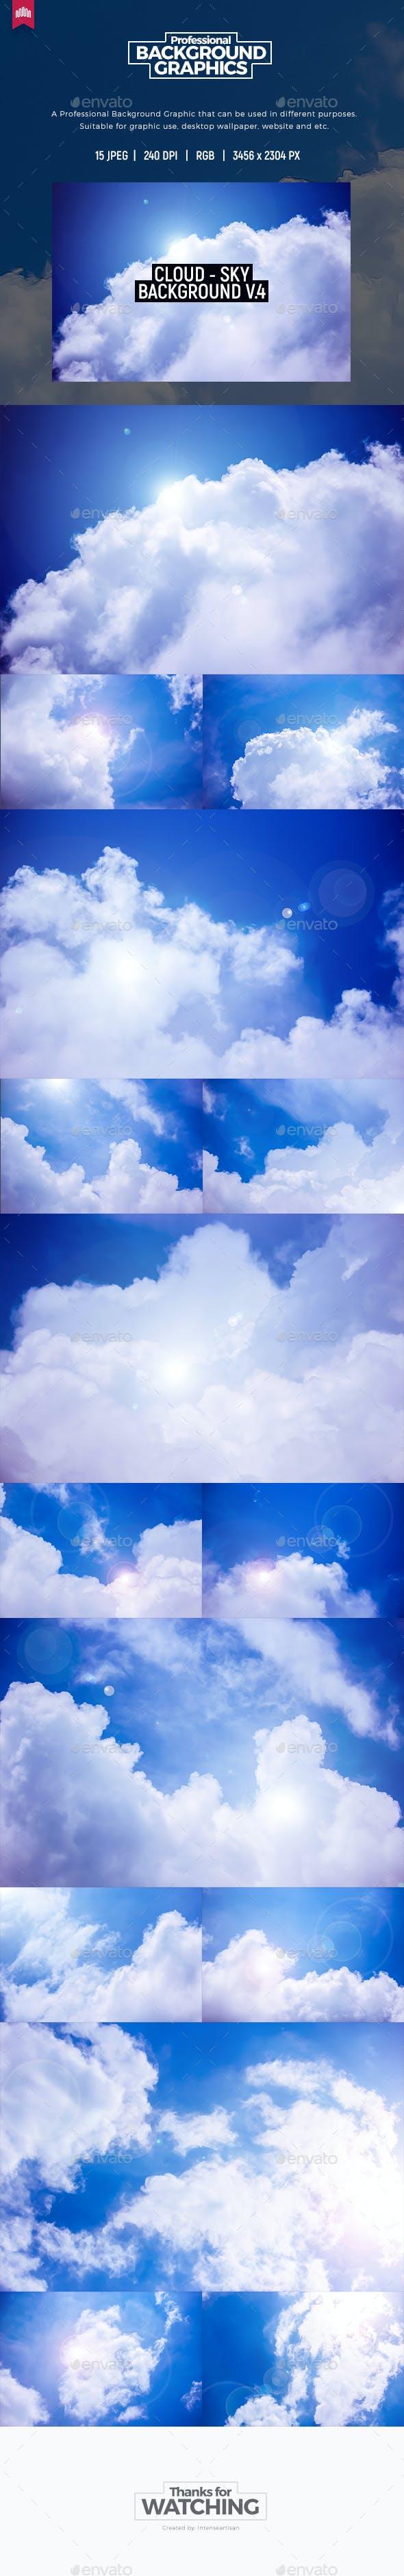 Cloud - Sky Background V.4